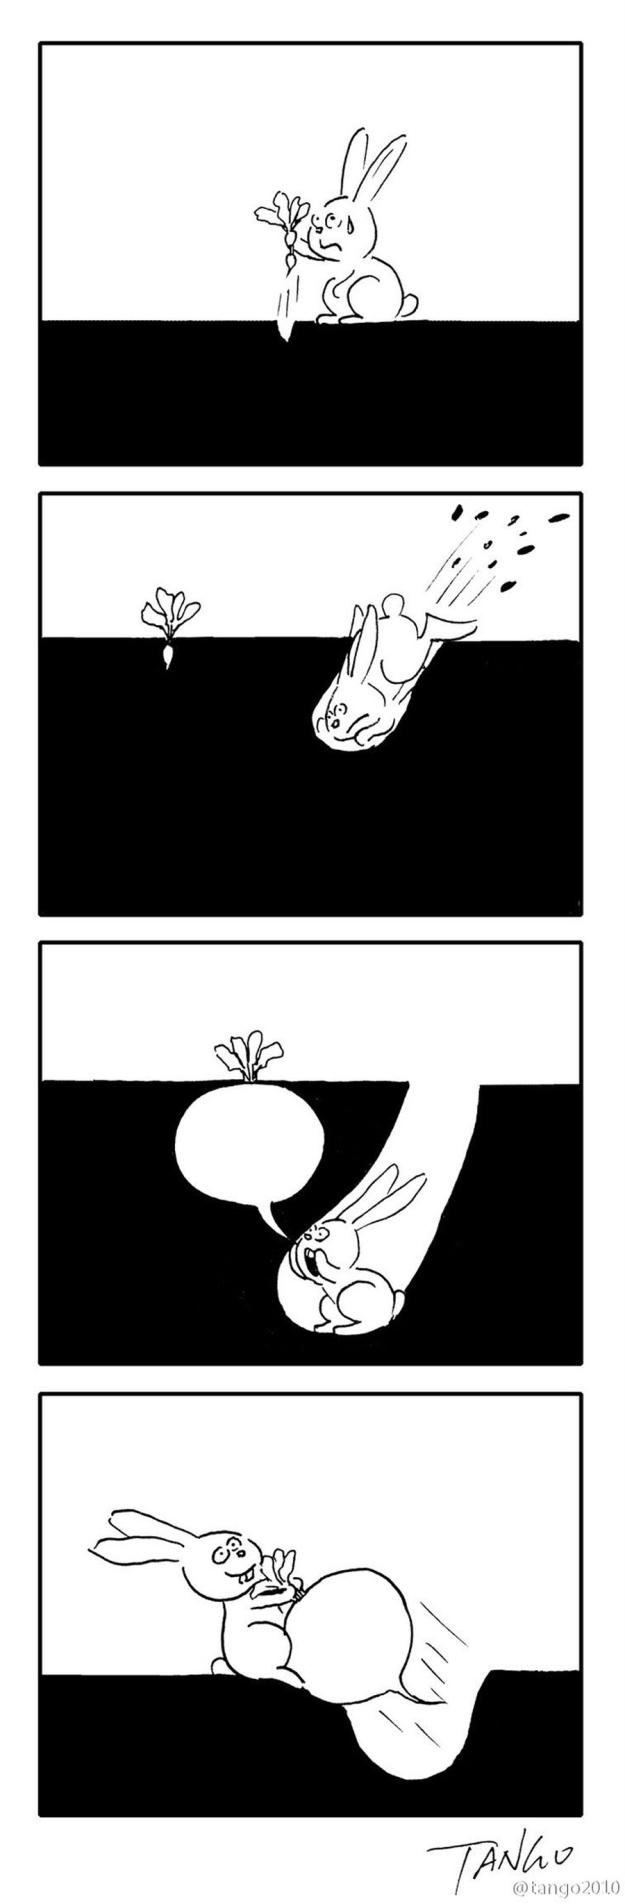 b--comic-illustrations-shanghai